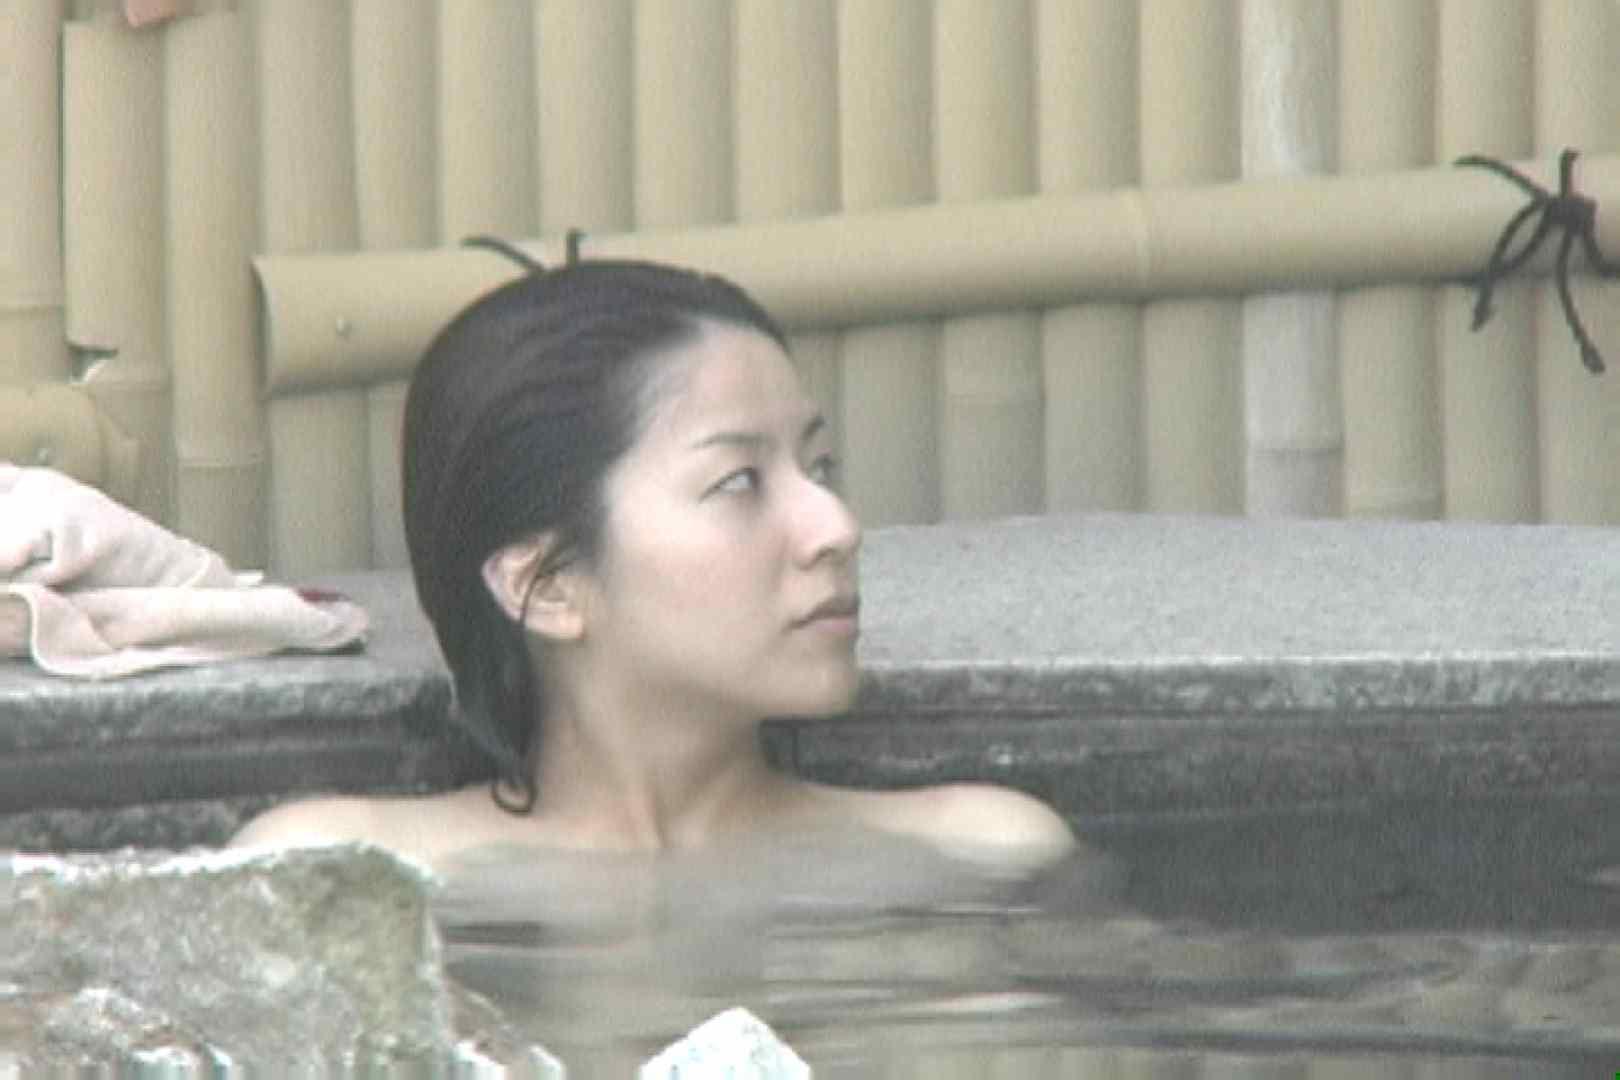 Aquaな露天風呂Vol.694 露天 オメコ無修正動画無料 110PICs 38